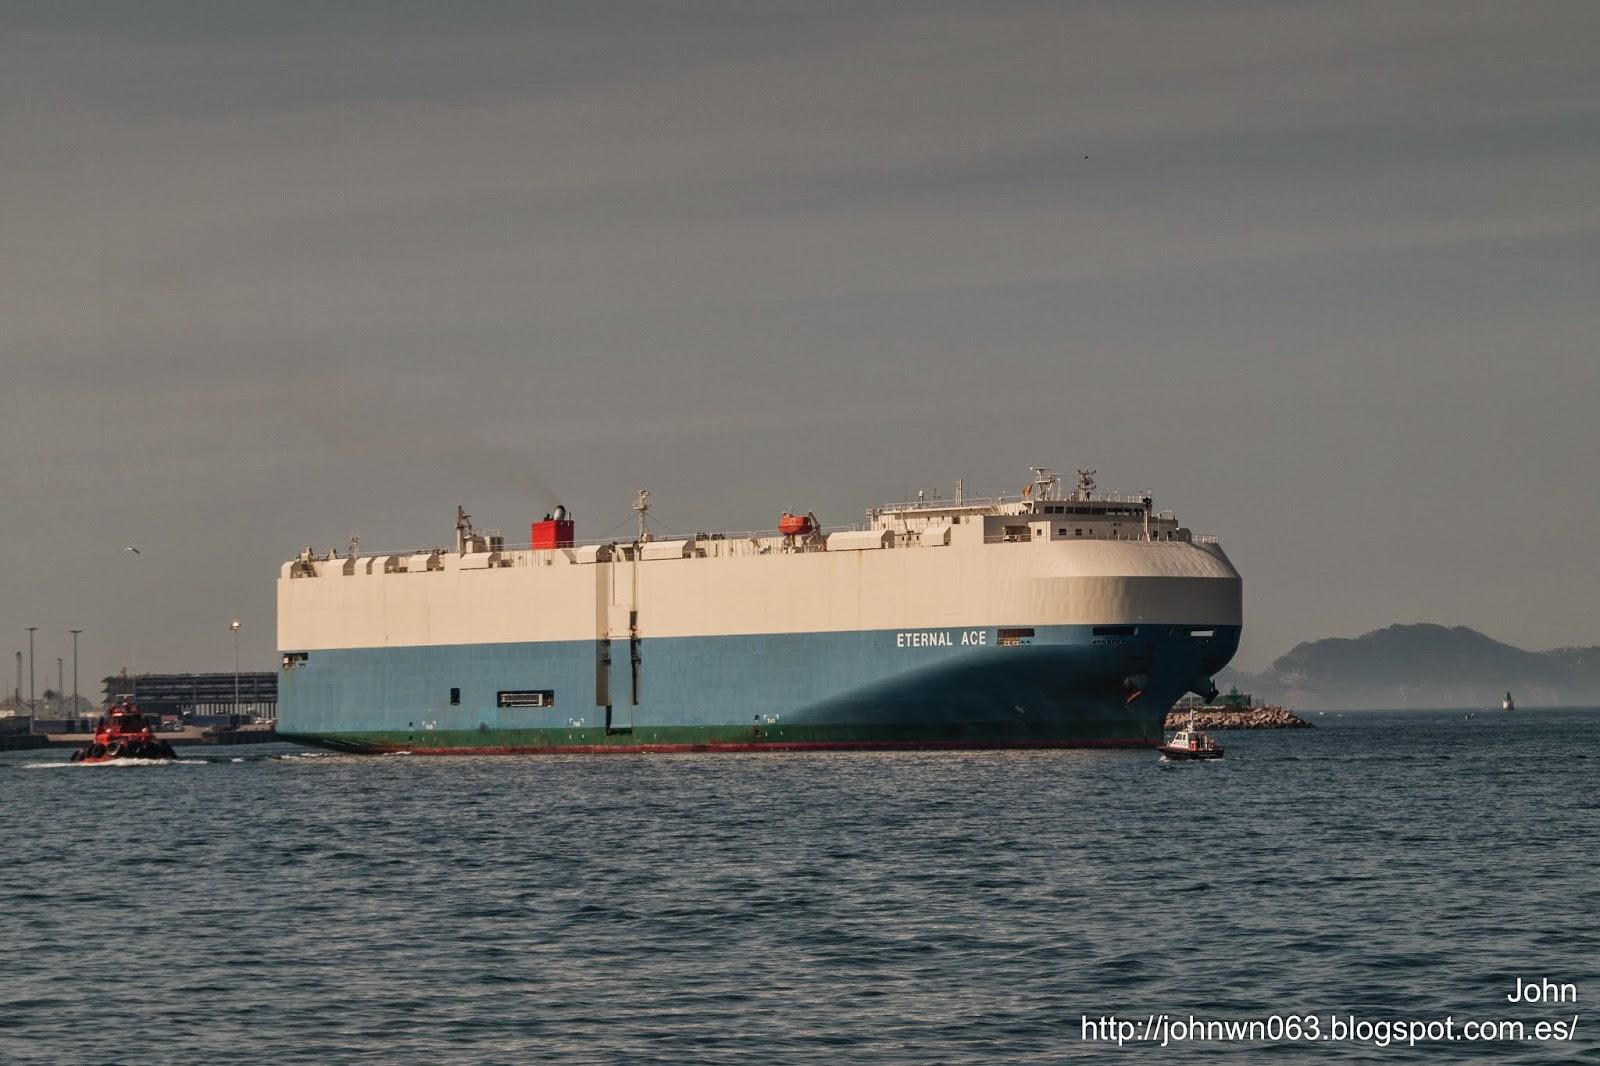 car carrier, fotos de barcos, eternal ace, vehicles carrier, vigo, bouzas